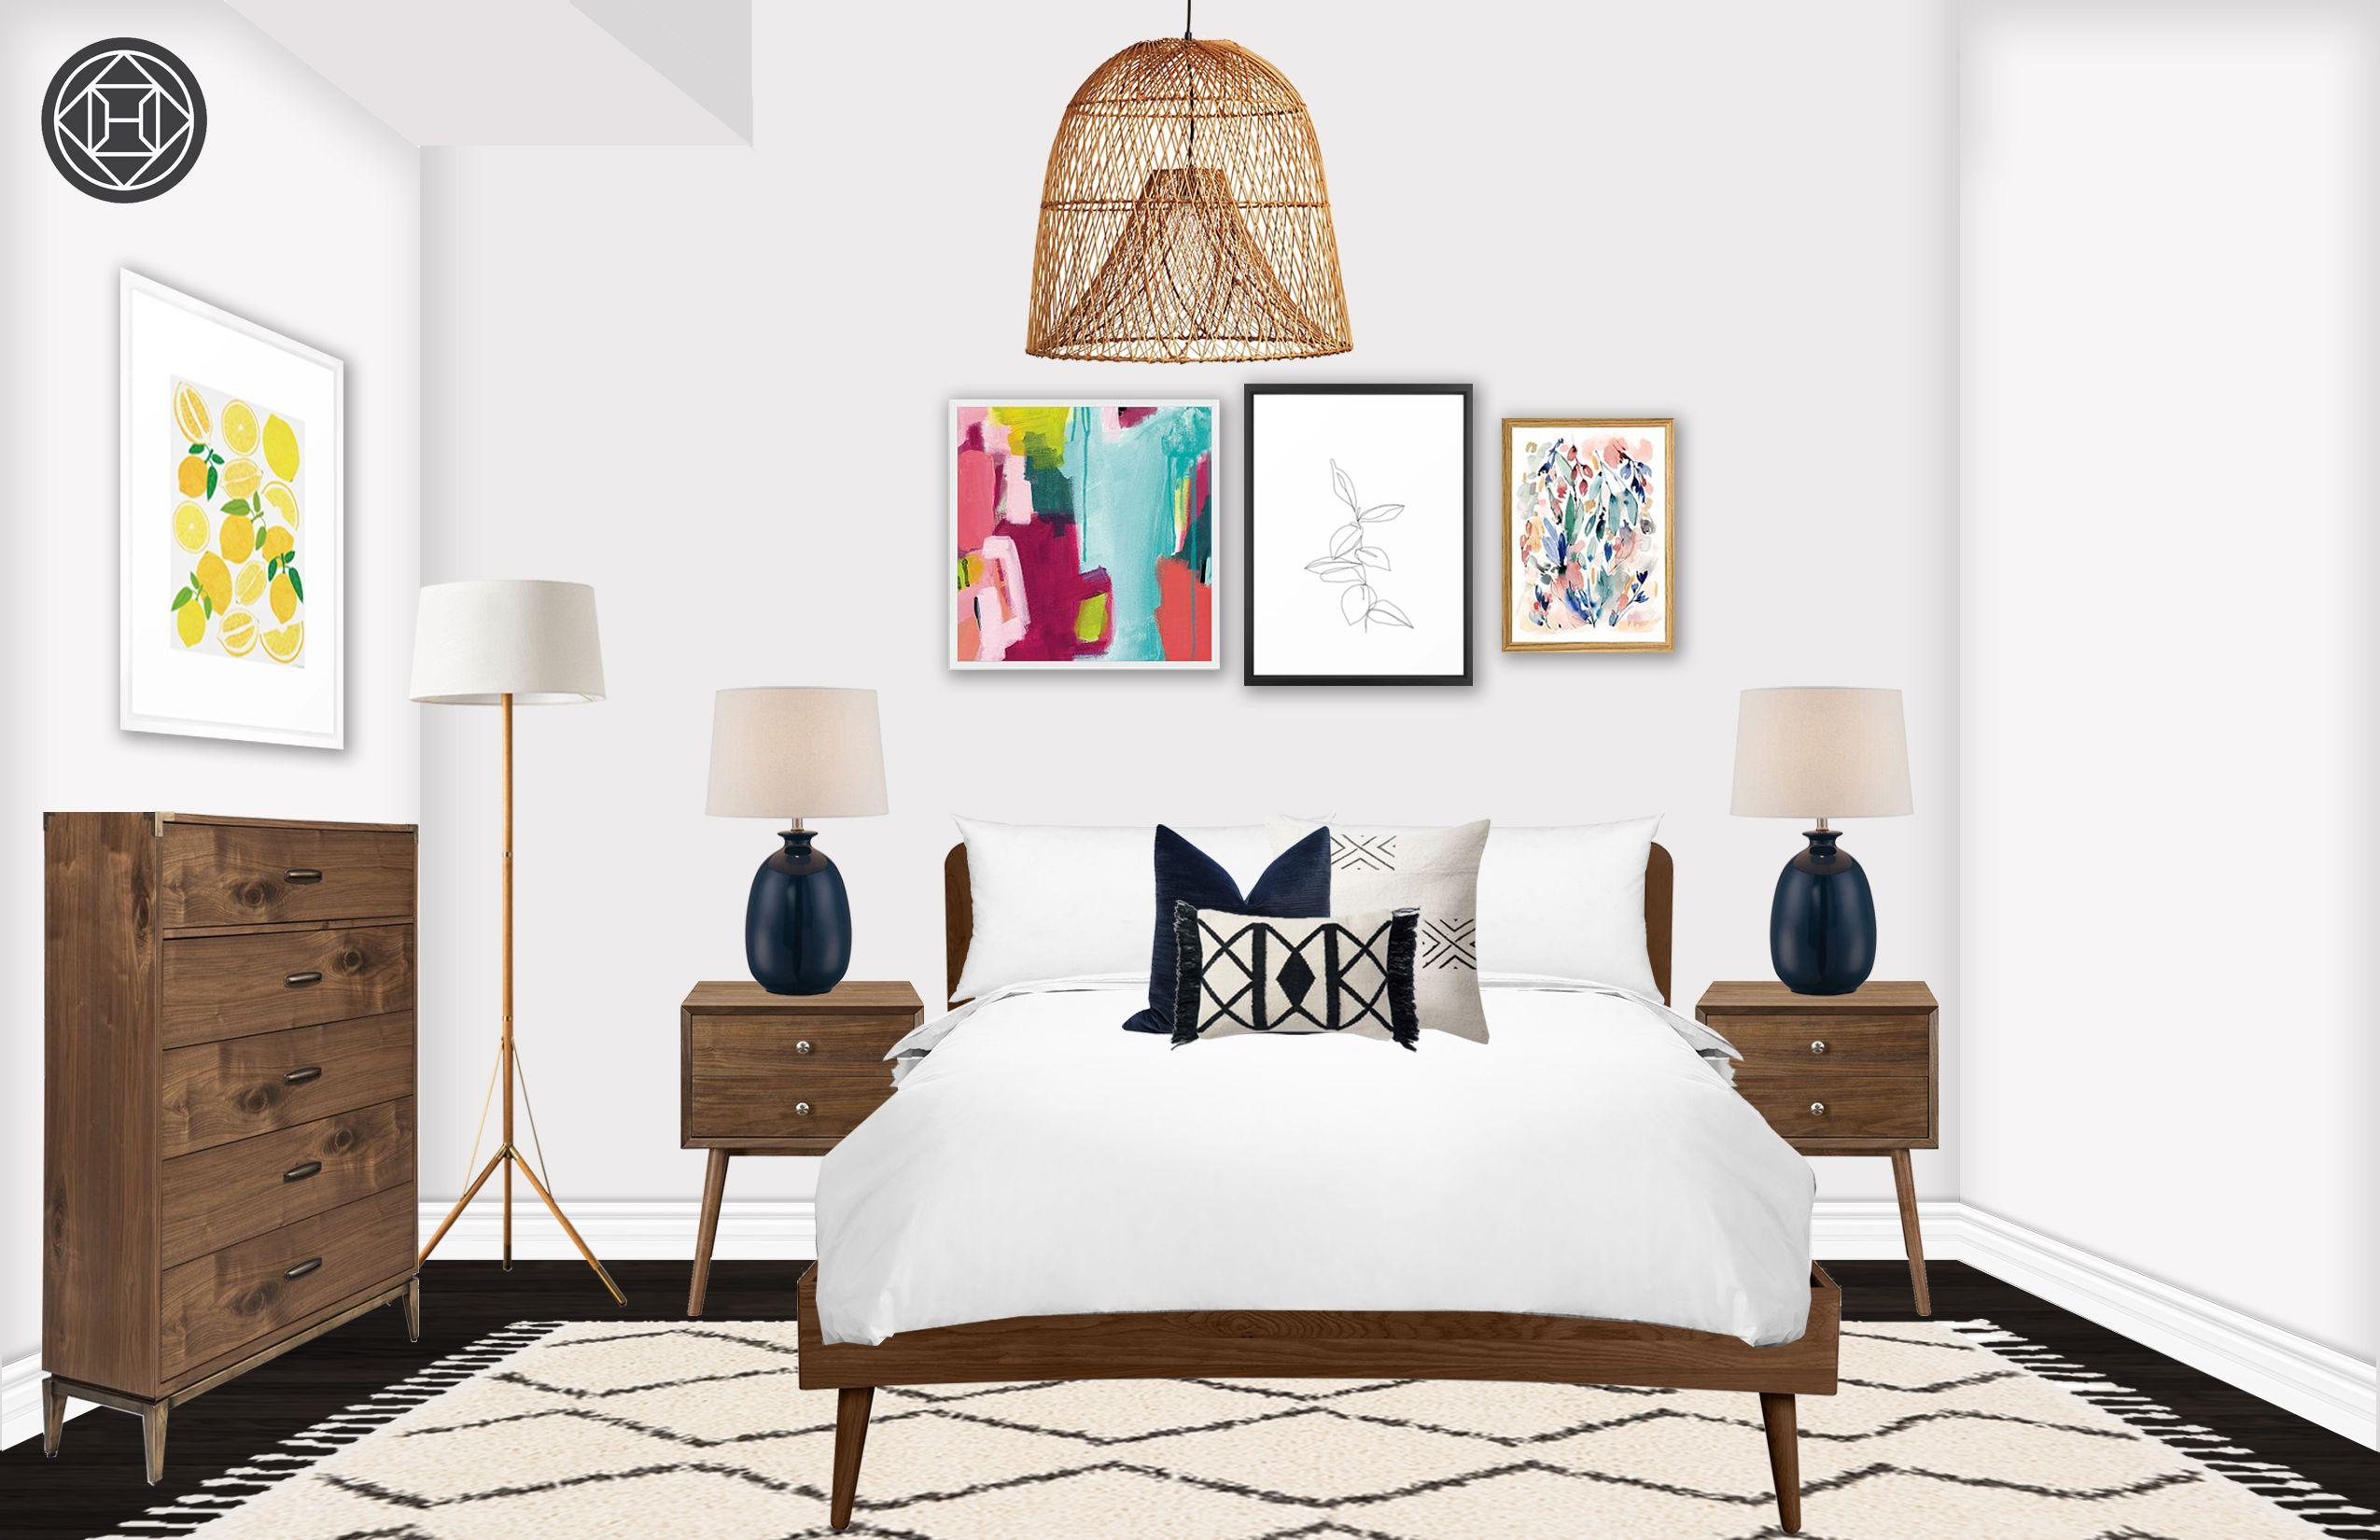 Mid Century Modern Bedroom Mid Century Modern Bedroom Design Mid Century Modern Bedroom Mid Century Modern Interior Design